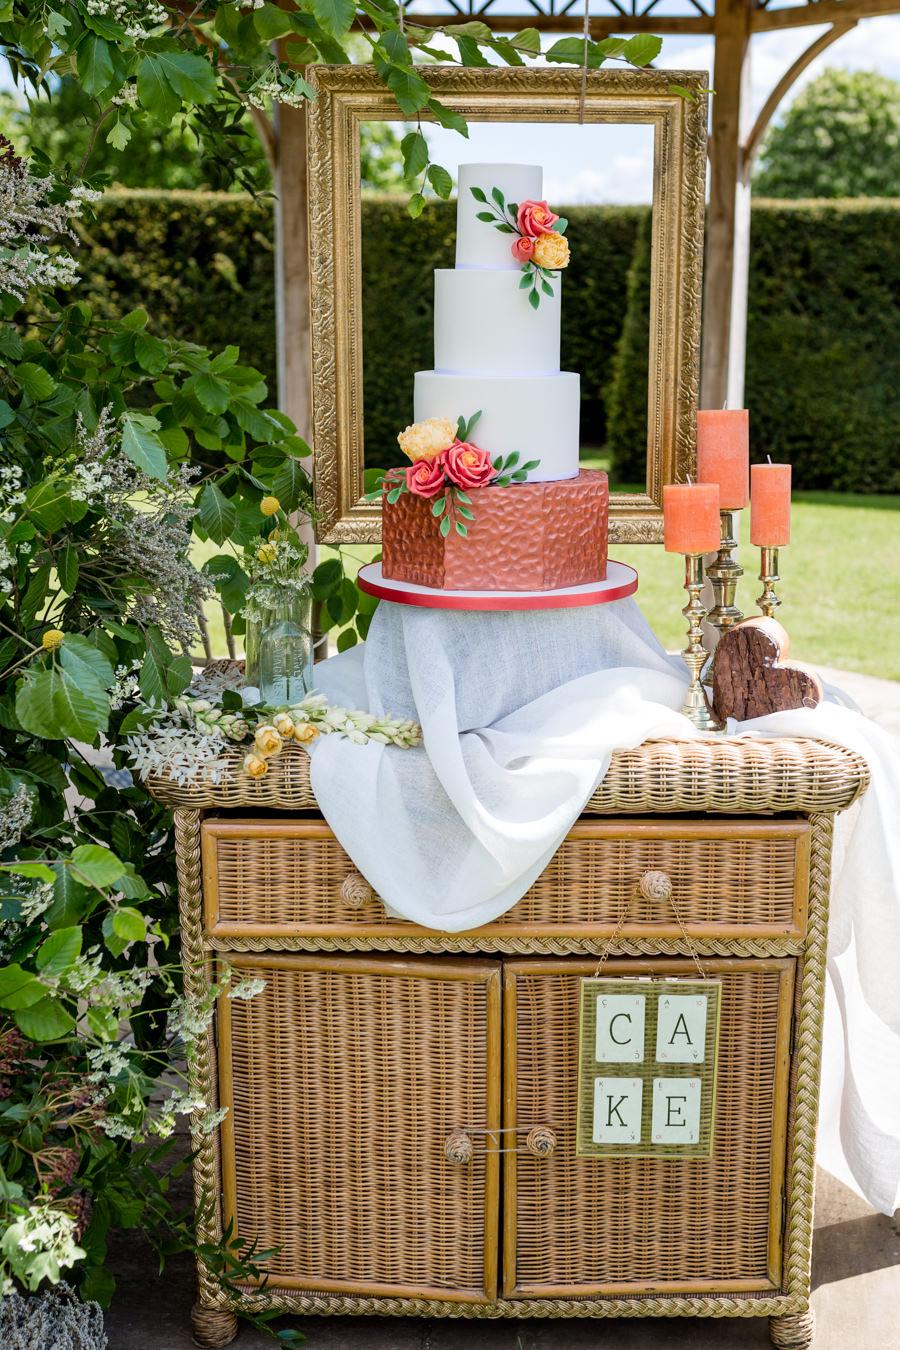 Boho luxe wedding style with soft orange and muted tones at Chippenham, image credit Heather Jackson Photography (22)